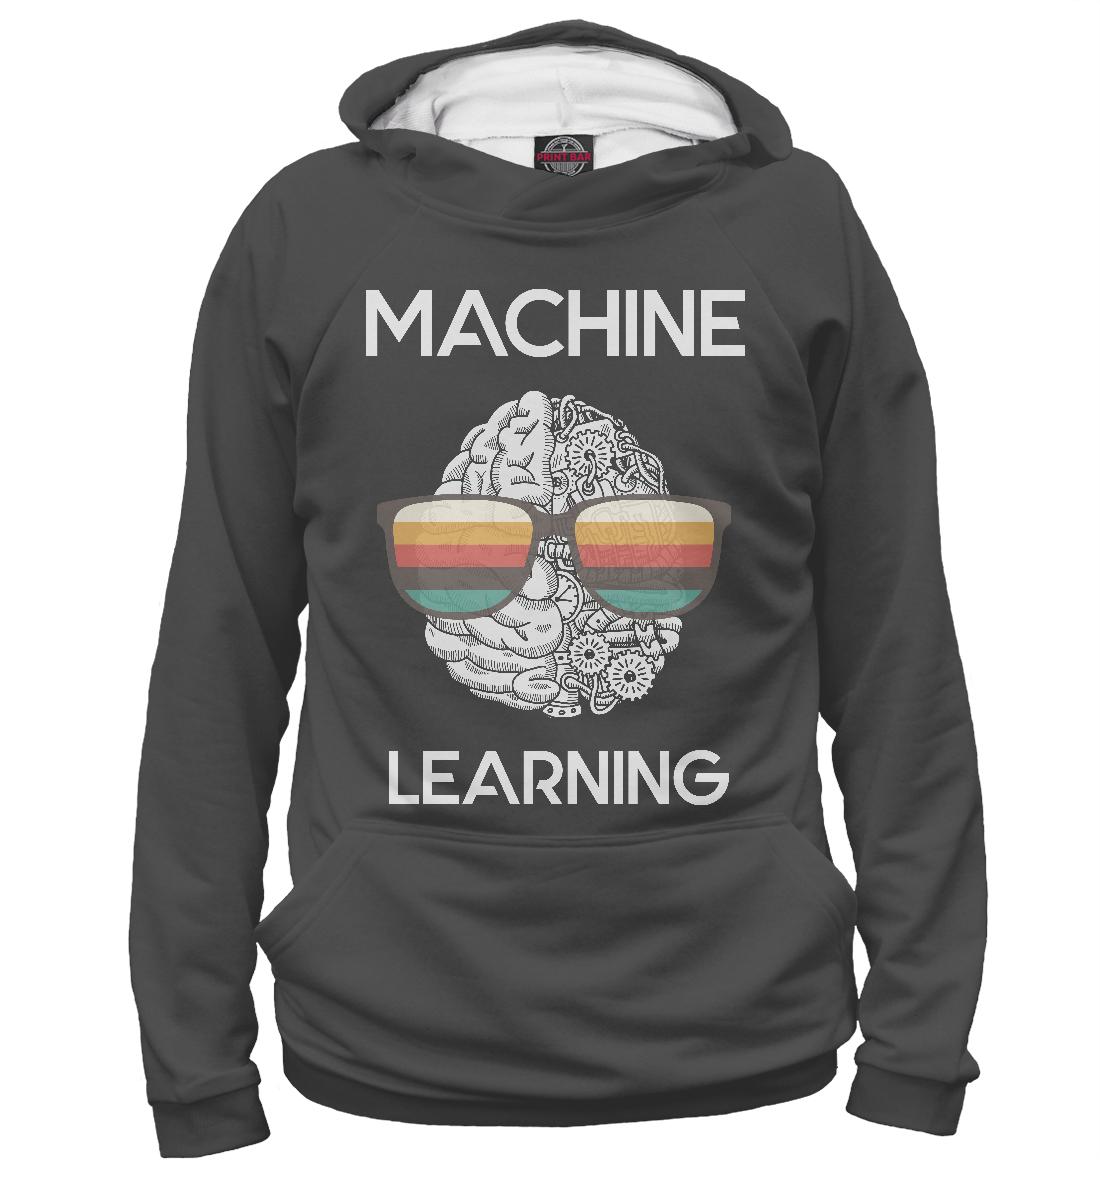 Фото - Machine Learning GeekBrain paolo perrotta machine learning für softwareentwickler